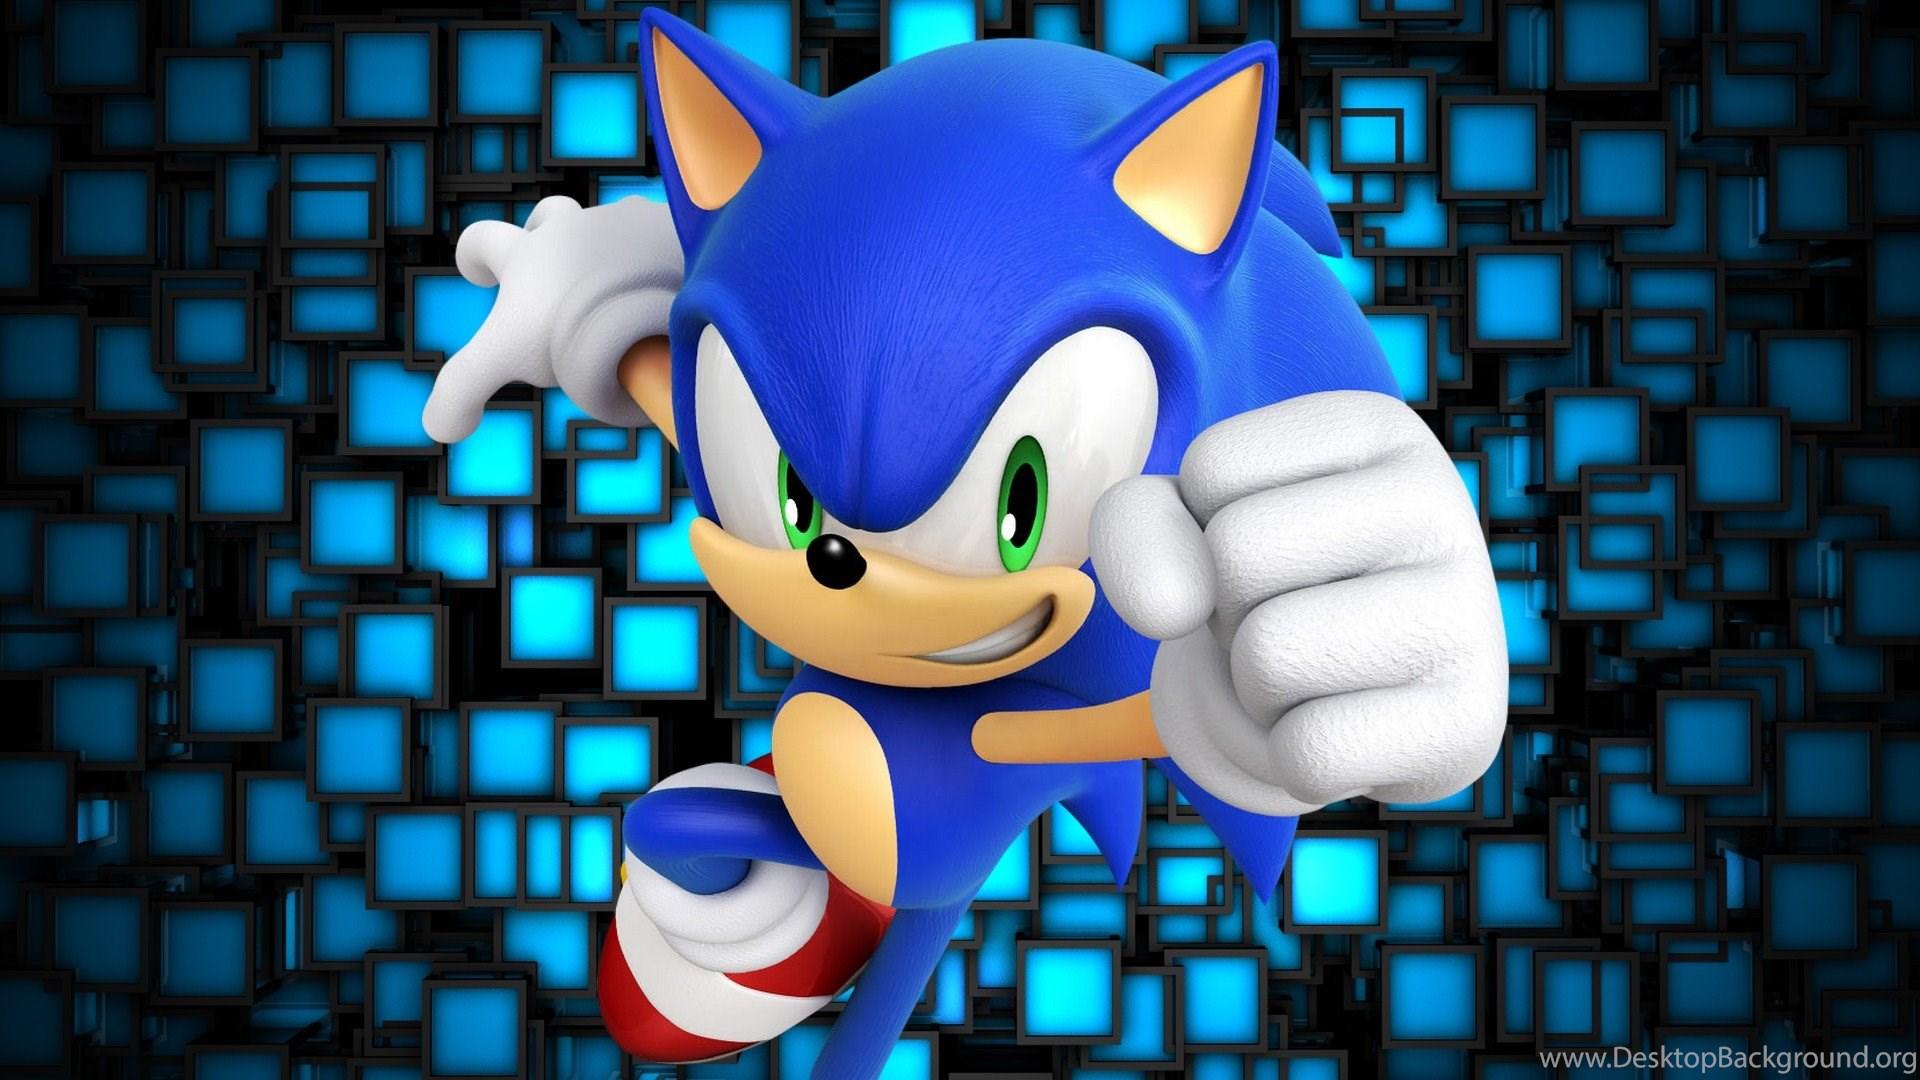 Sonic The Hedgehog Hd Wallpapers Desktop Background